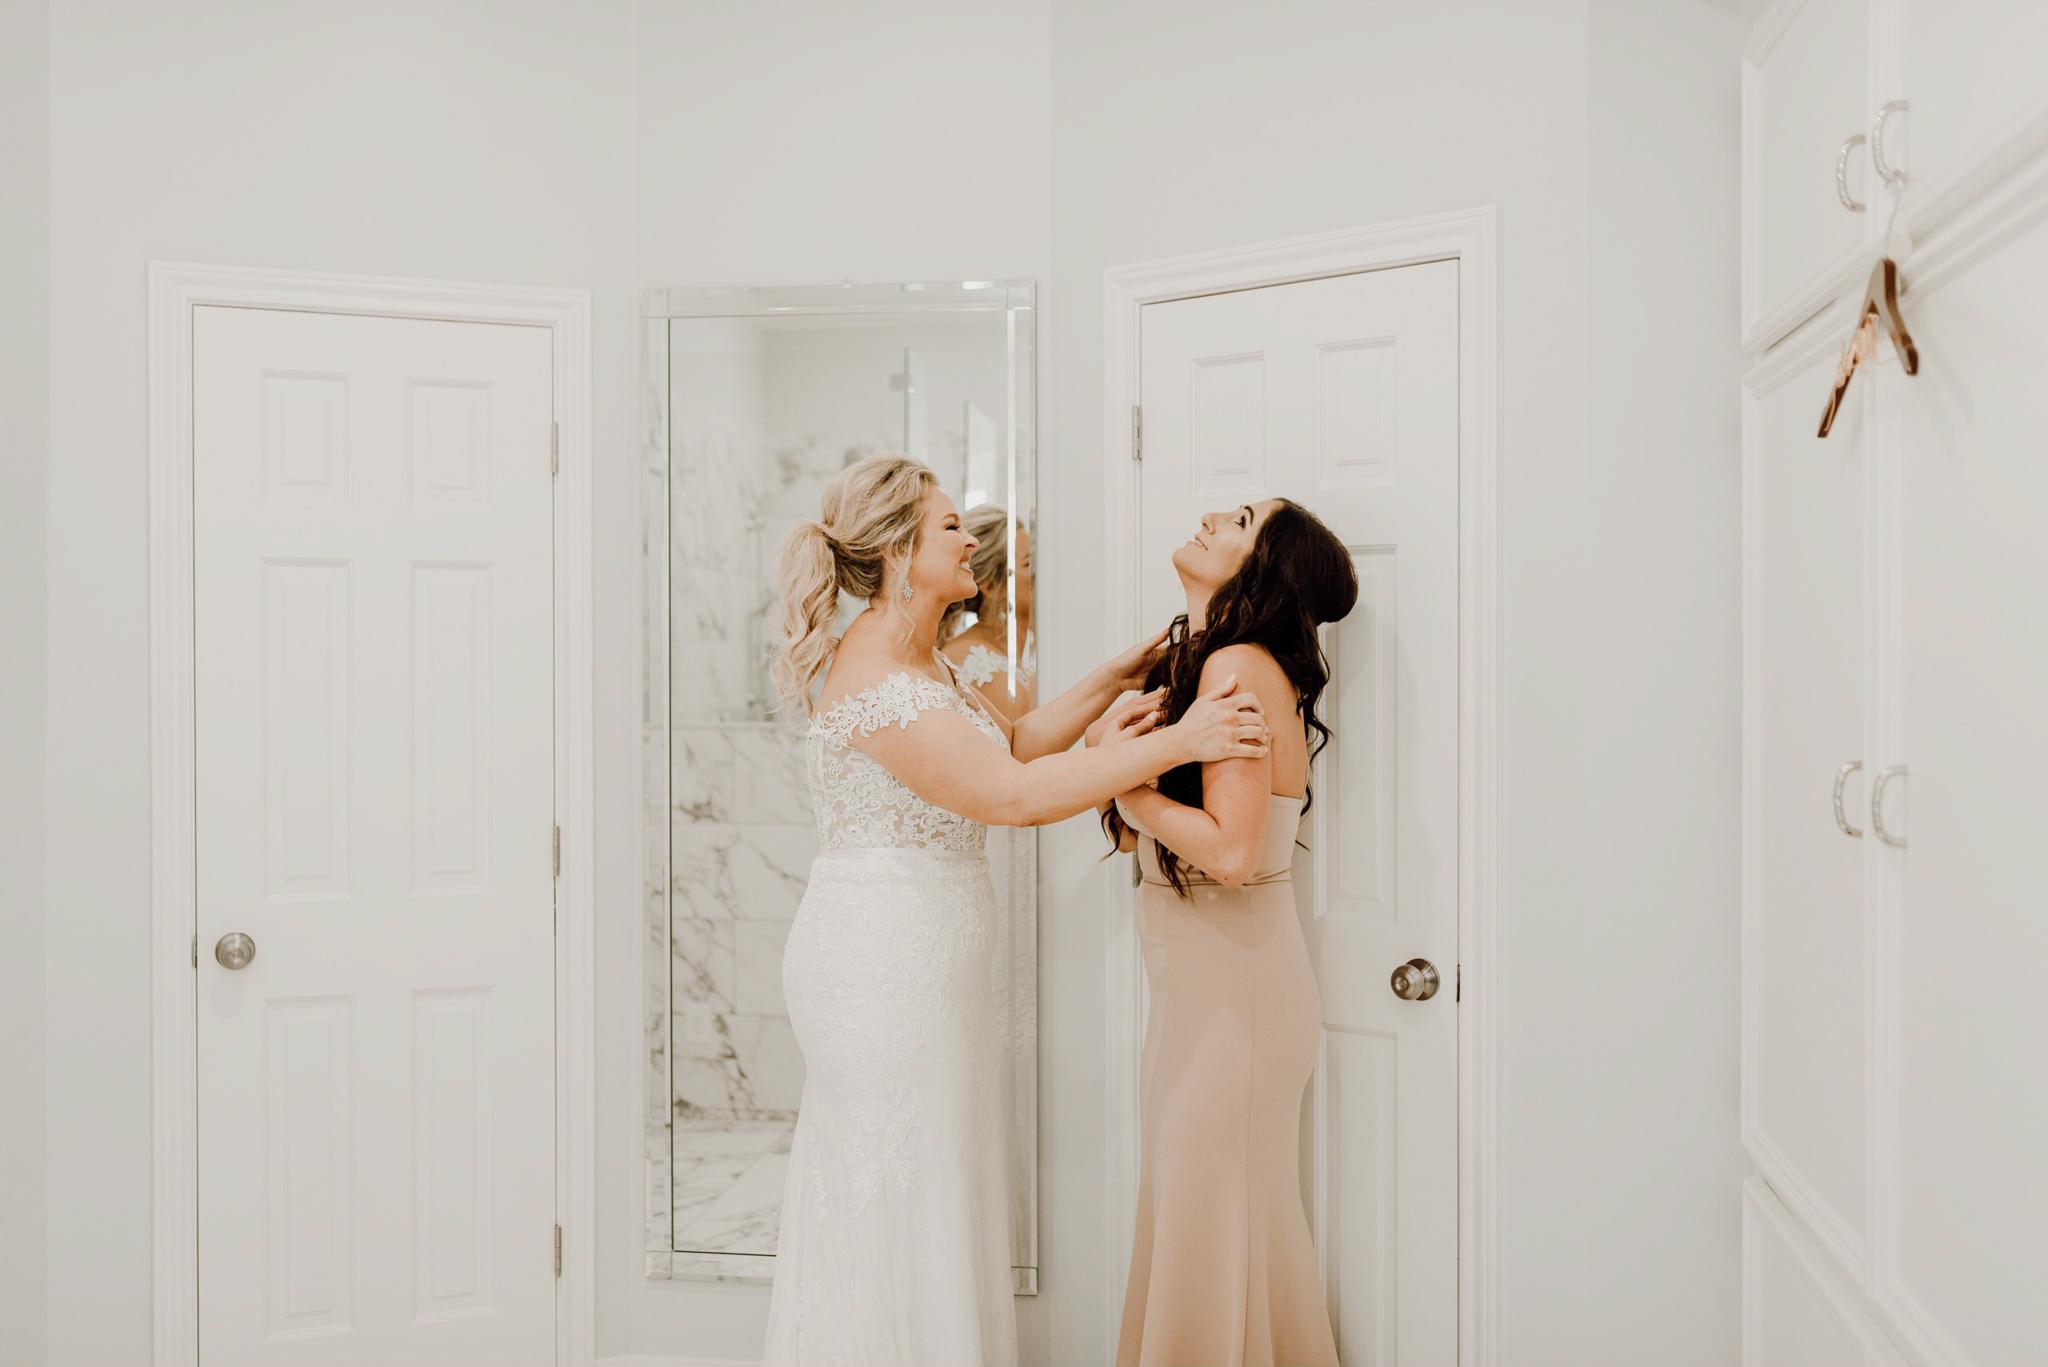 Houston Wedding Photographer-Intimate Texas Backyard Wedding- Houston Wedding Photographer -Kristen Giles Photography-25.jpg